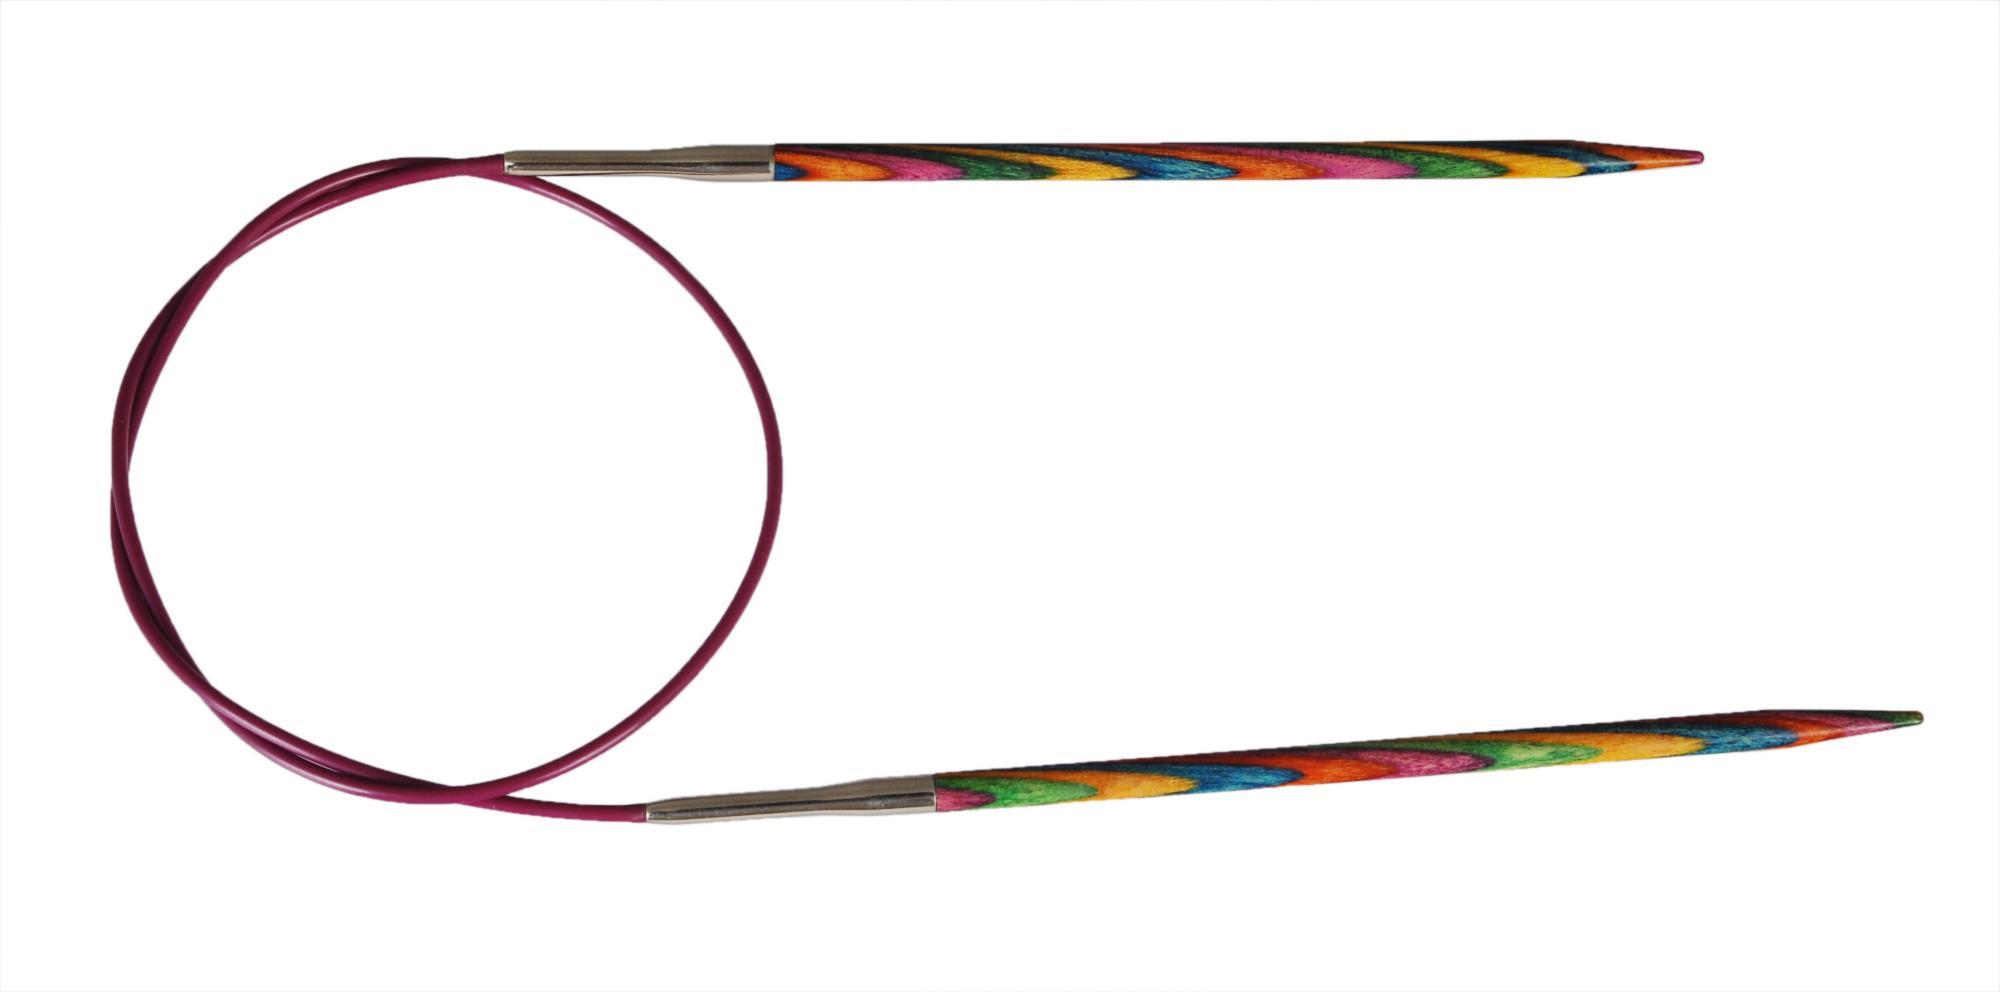 Спицы круговые 150 см Symfonie Wood KnitPro, 20514, 2.75 мм